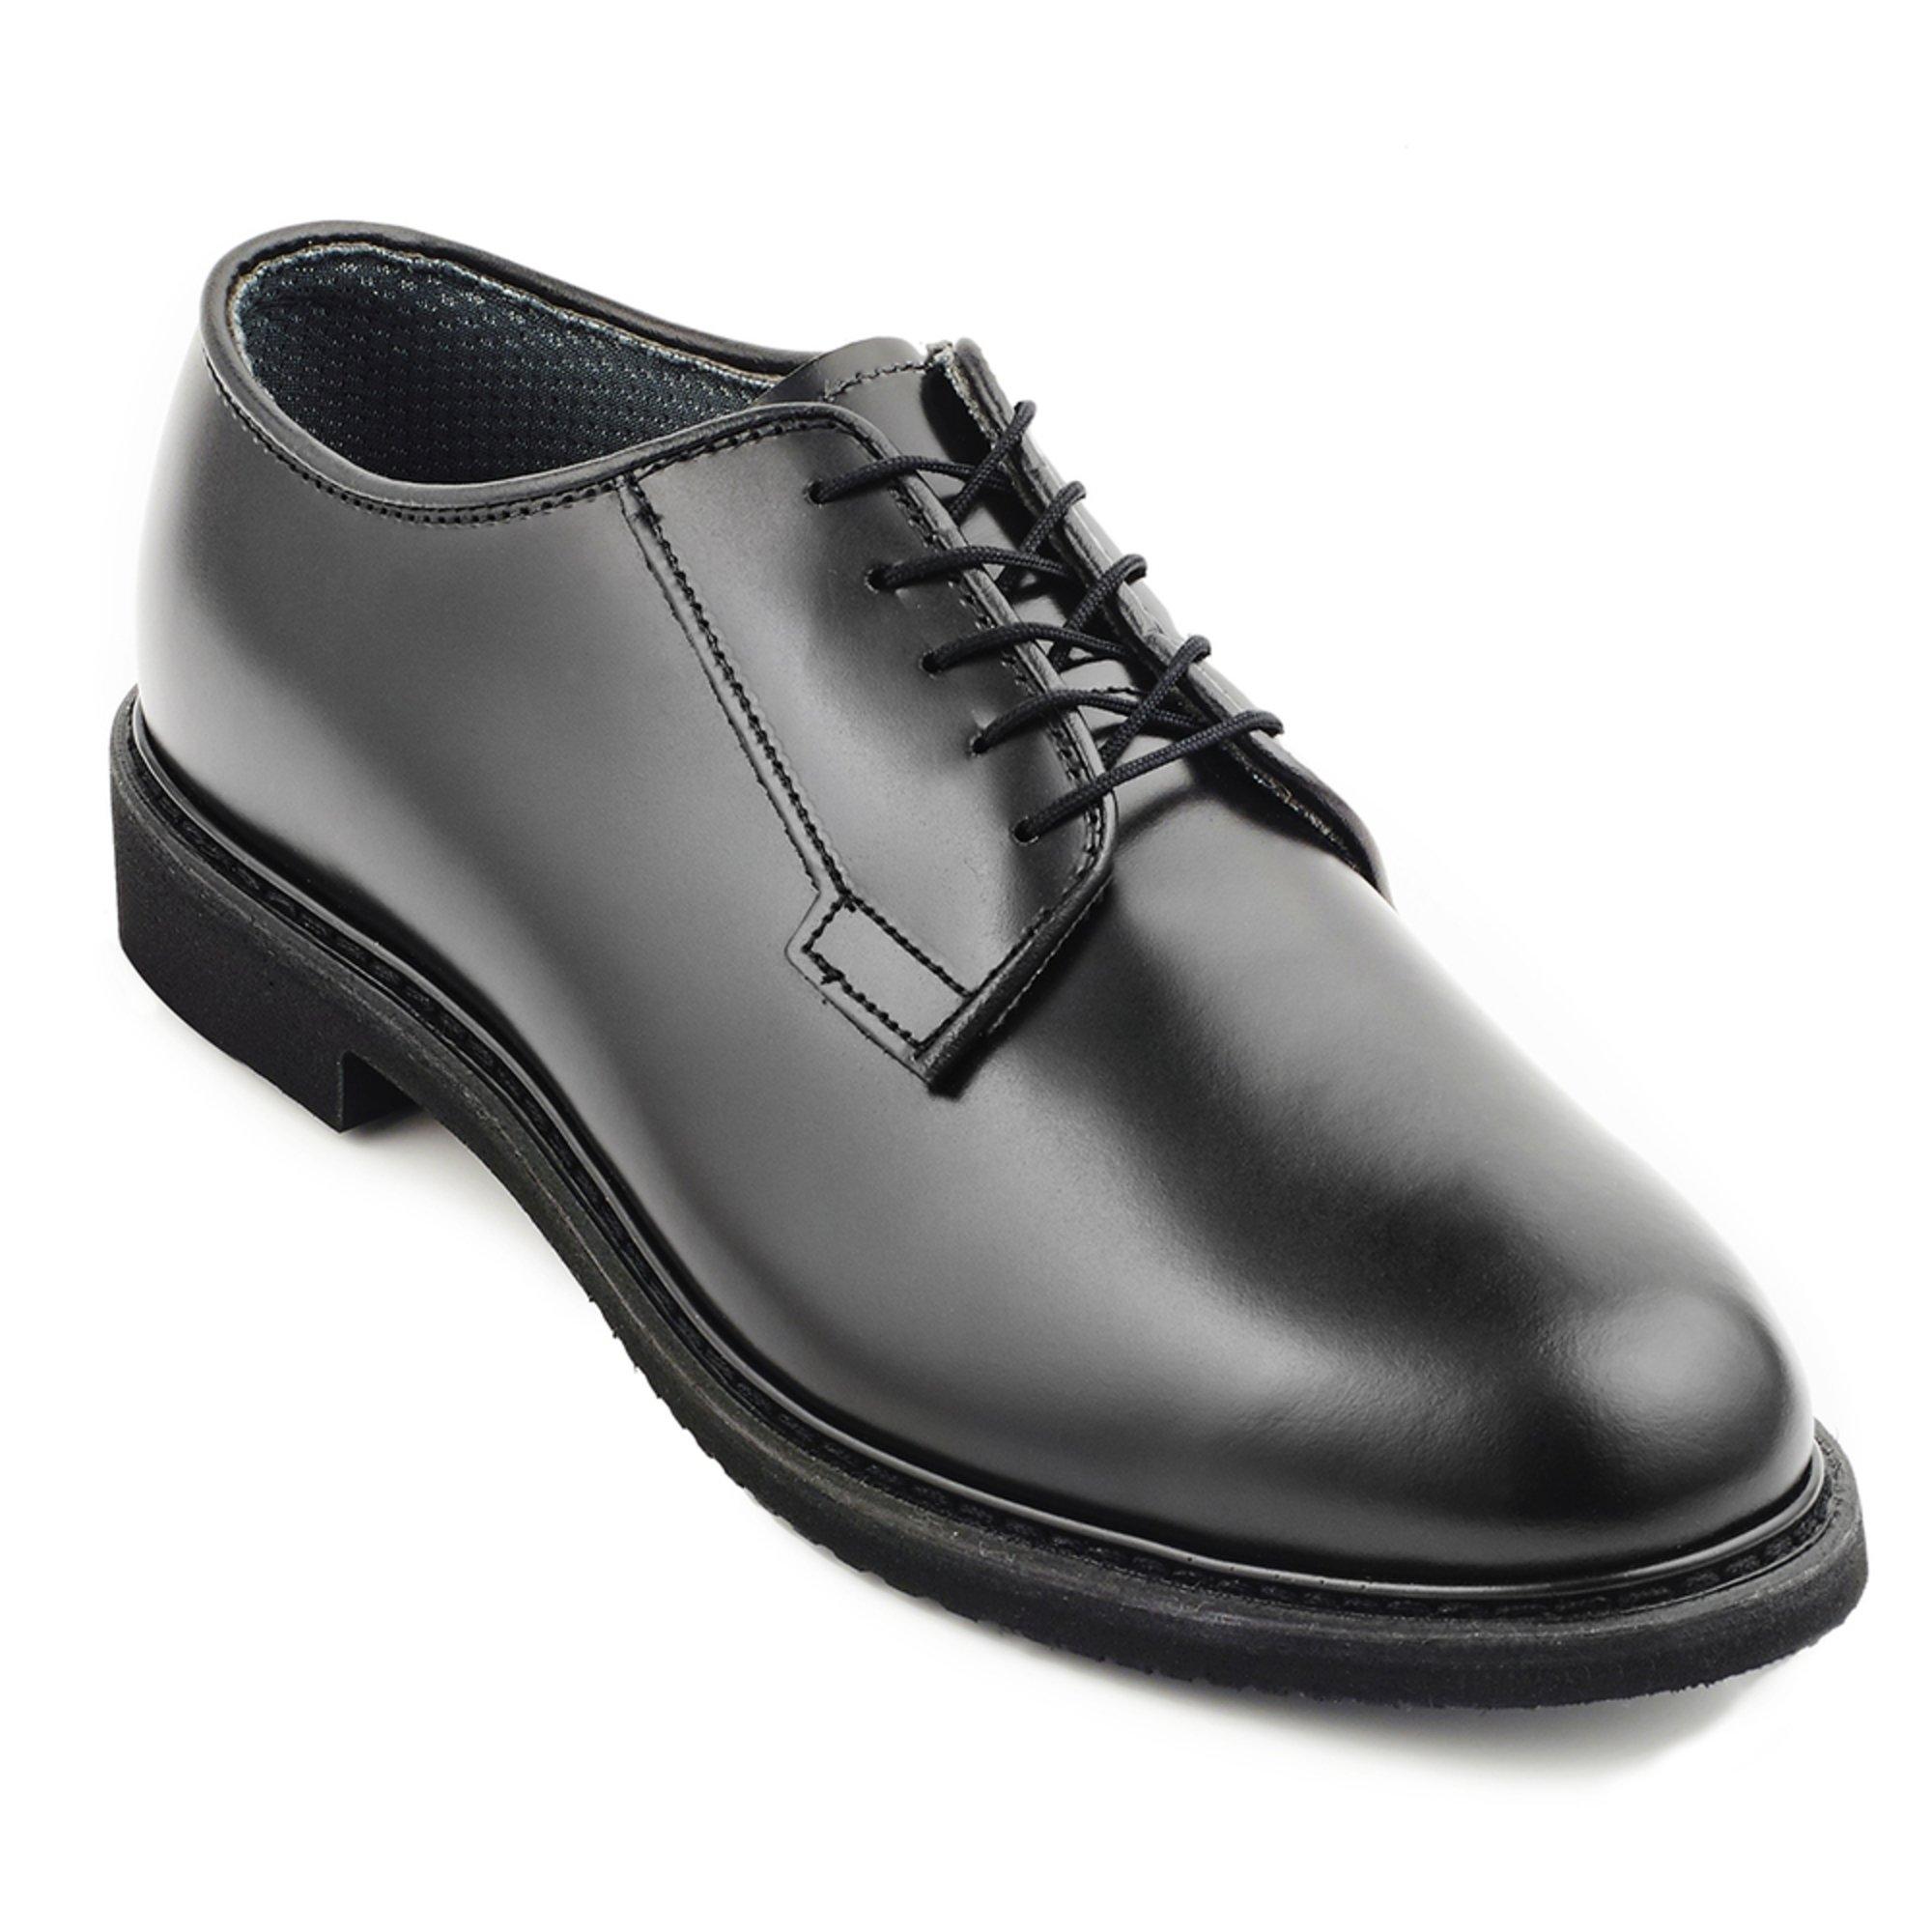 Black Leather Upper Dress Oxford